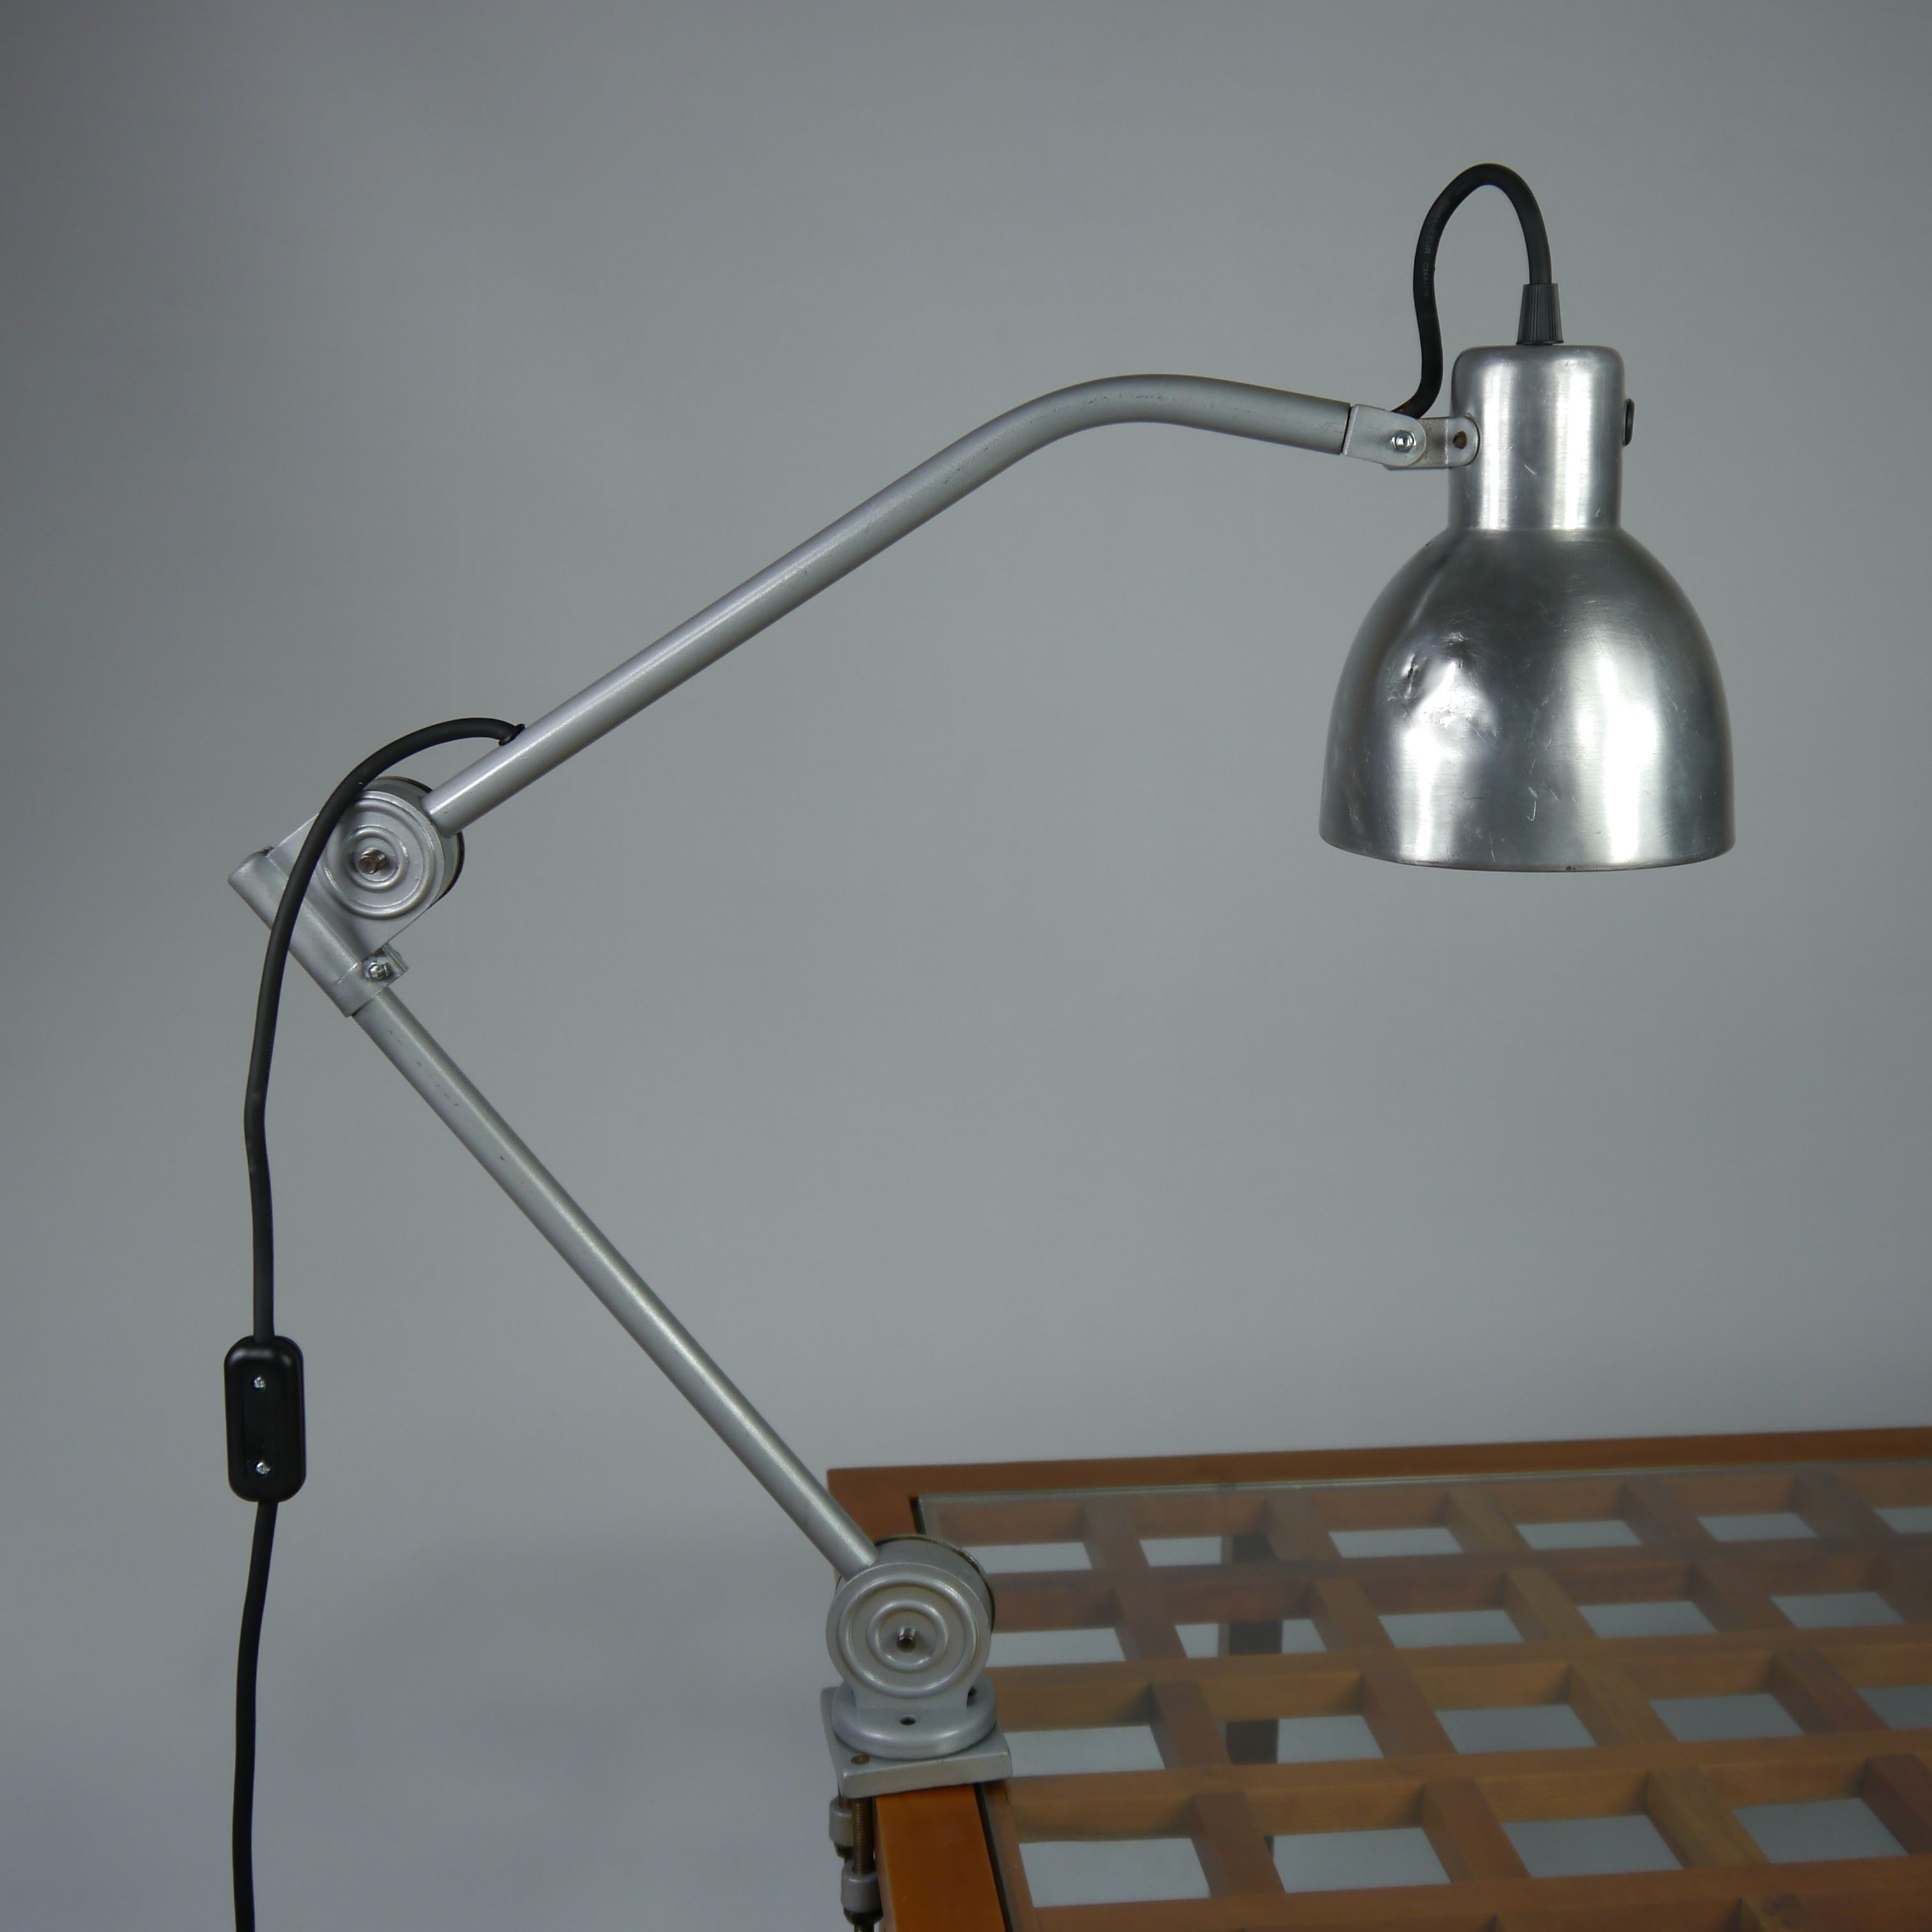 Machinist's desk lamp //www.sroka.uk.com/machinist-s-desk-lamp ... on grey walls with fireplace, grey walls with design, grey walls with wood furniture, grey walls with art ideas,